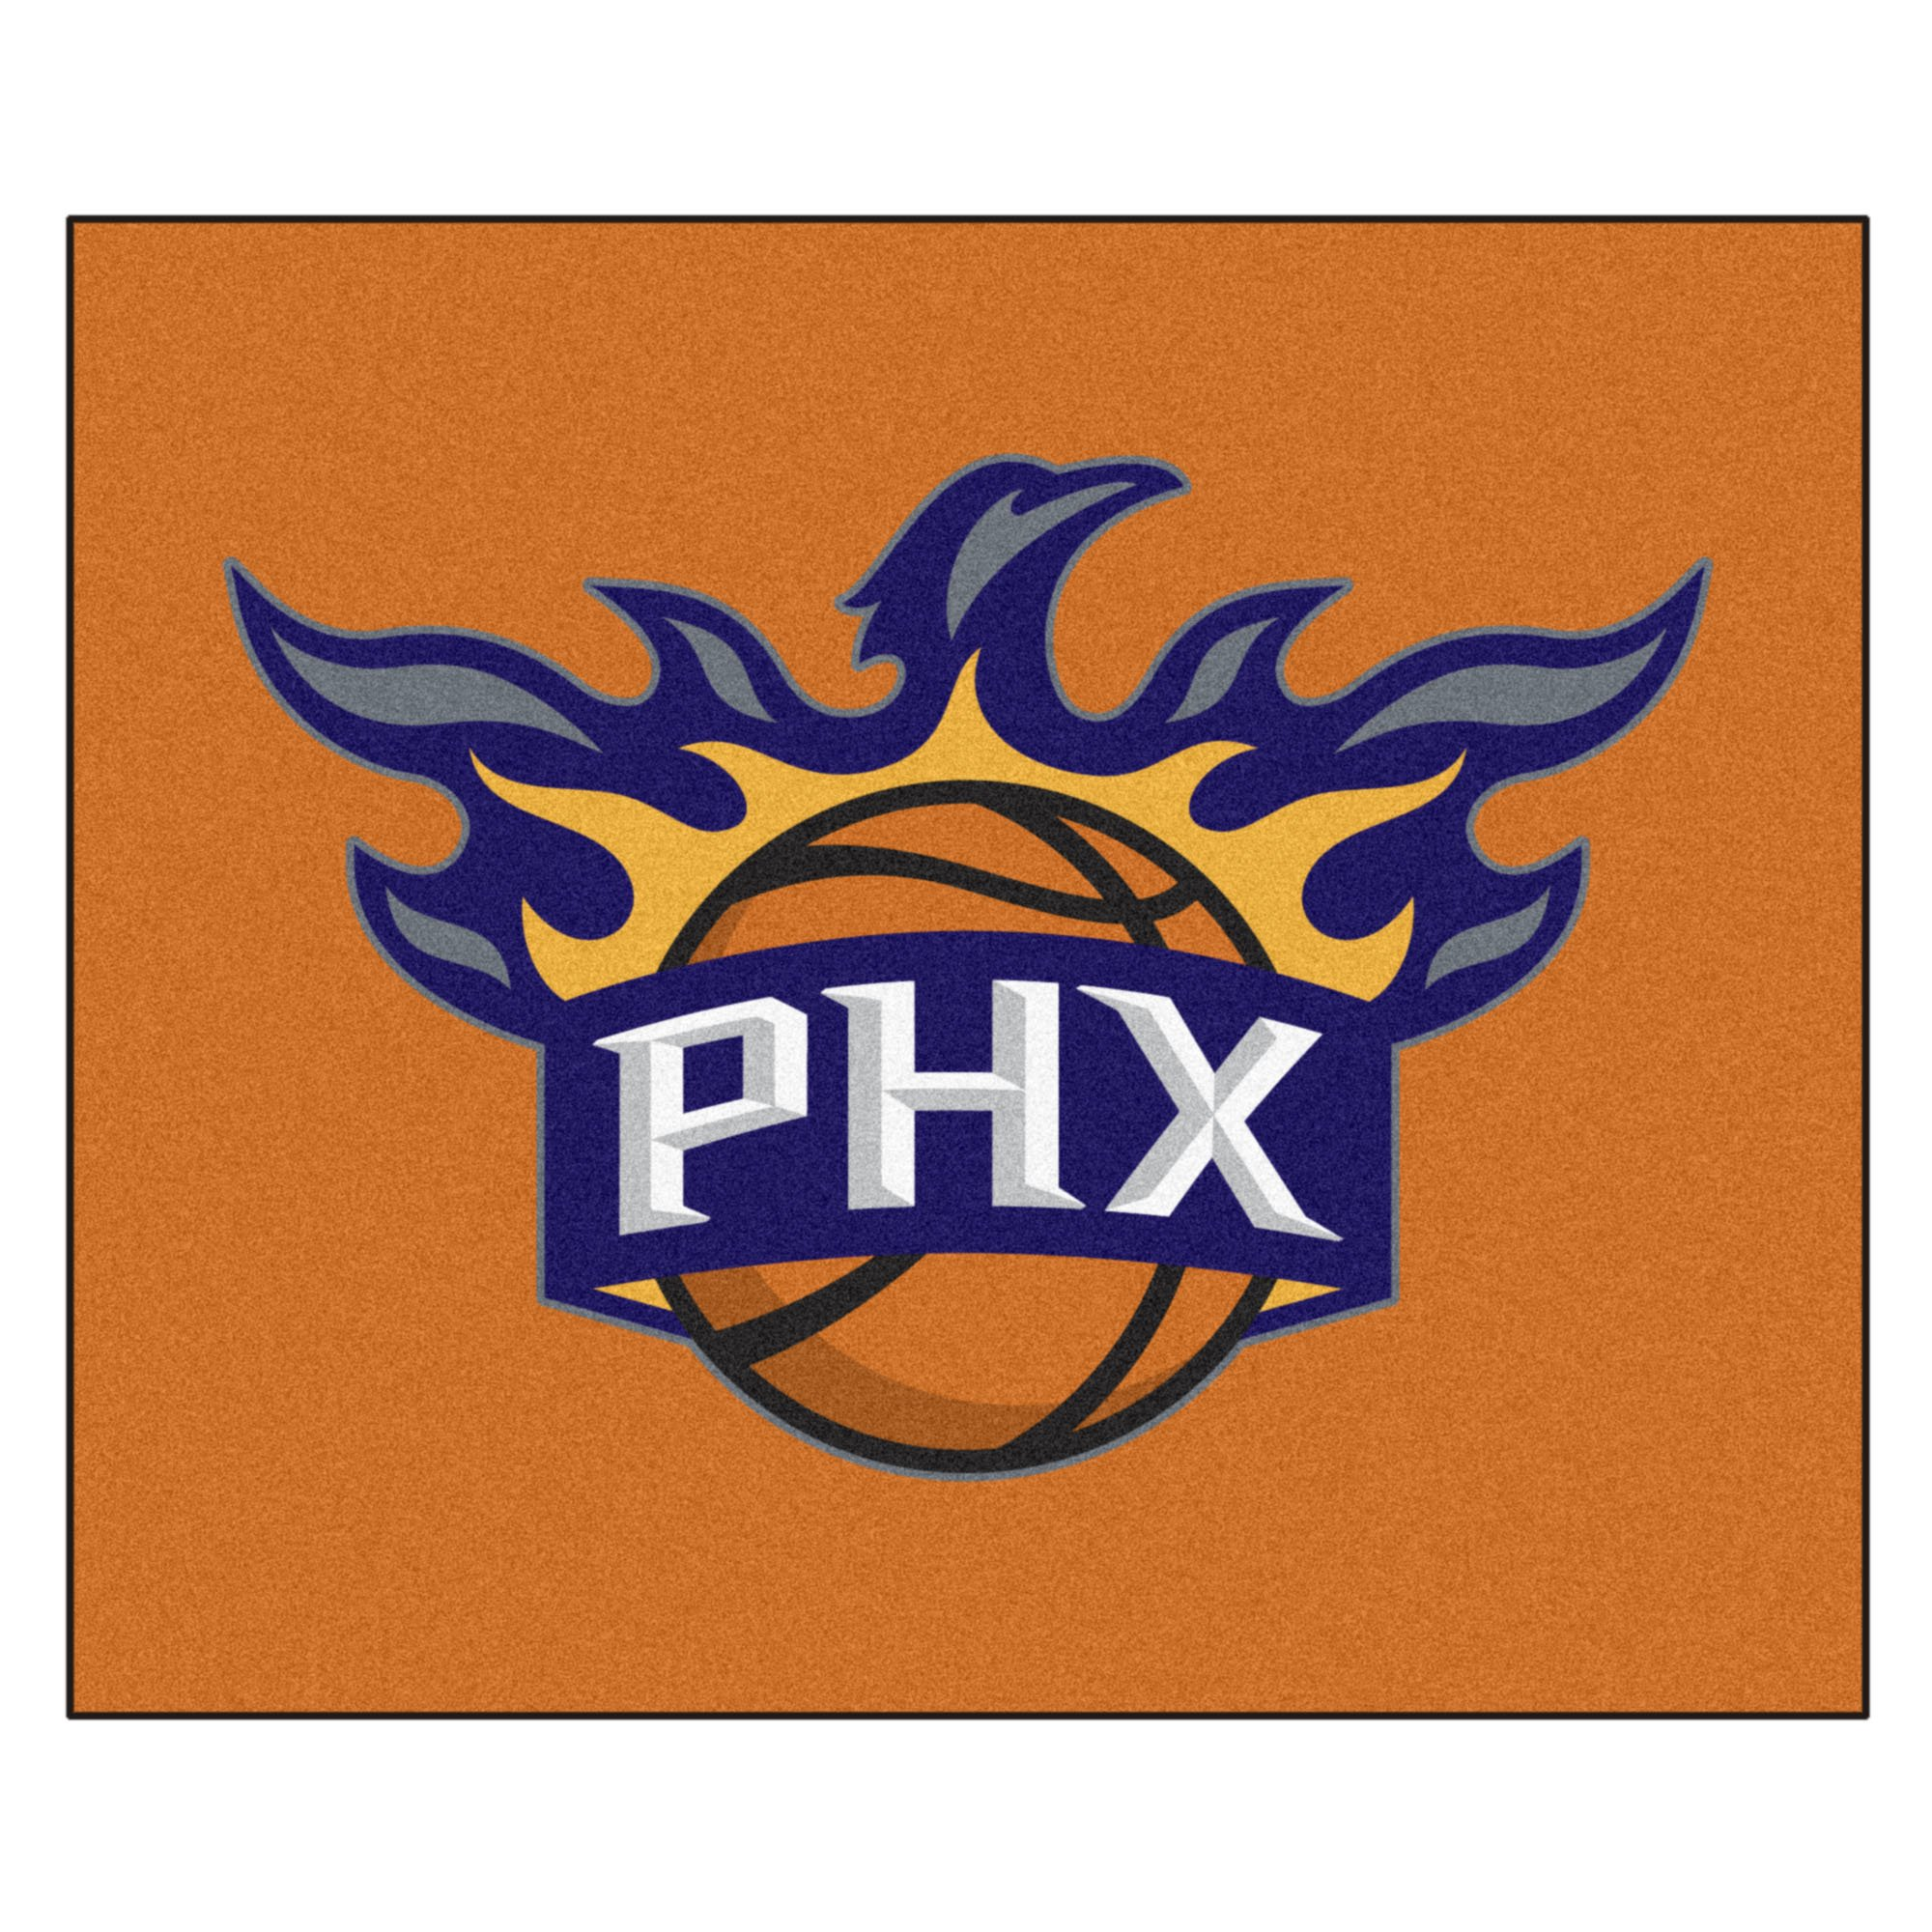 FANMATS 19470 NBA - Phoenix Suns Tailgater Rug , Team Color, 59.5''x71''